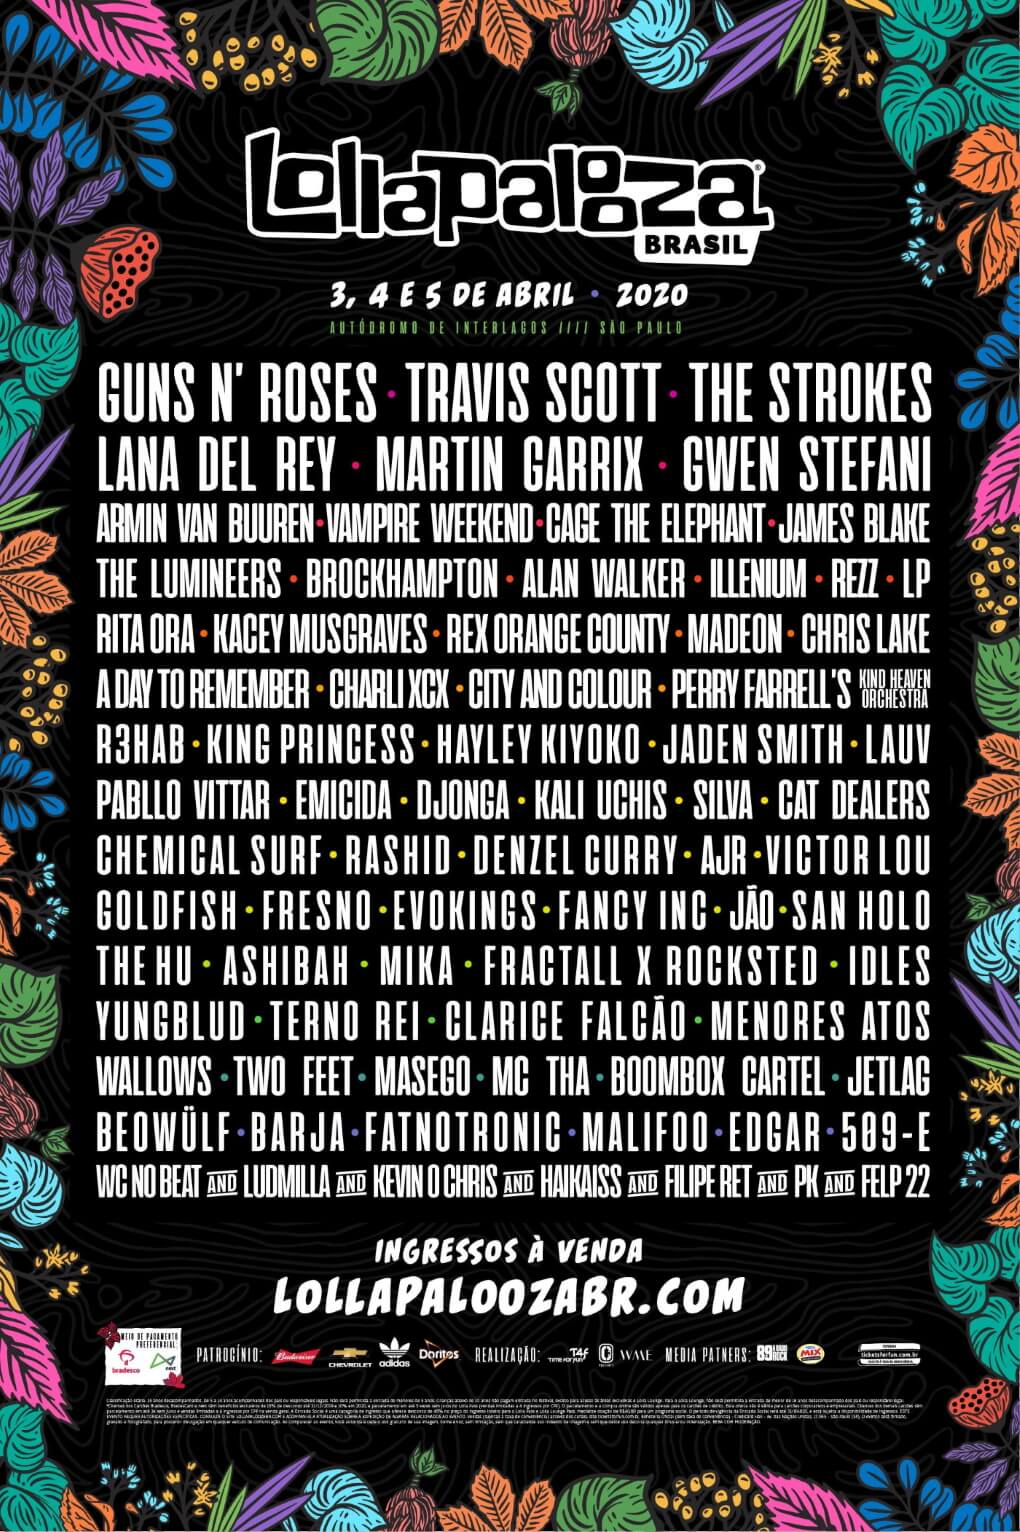 Lollapalooza Brasil 2020 - Line-up